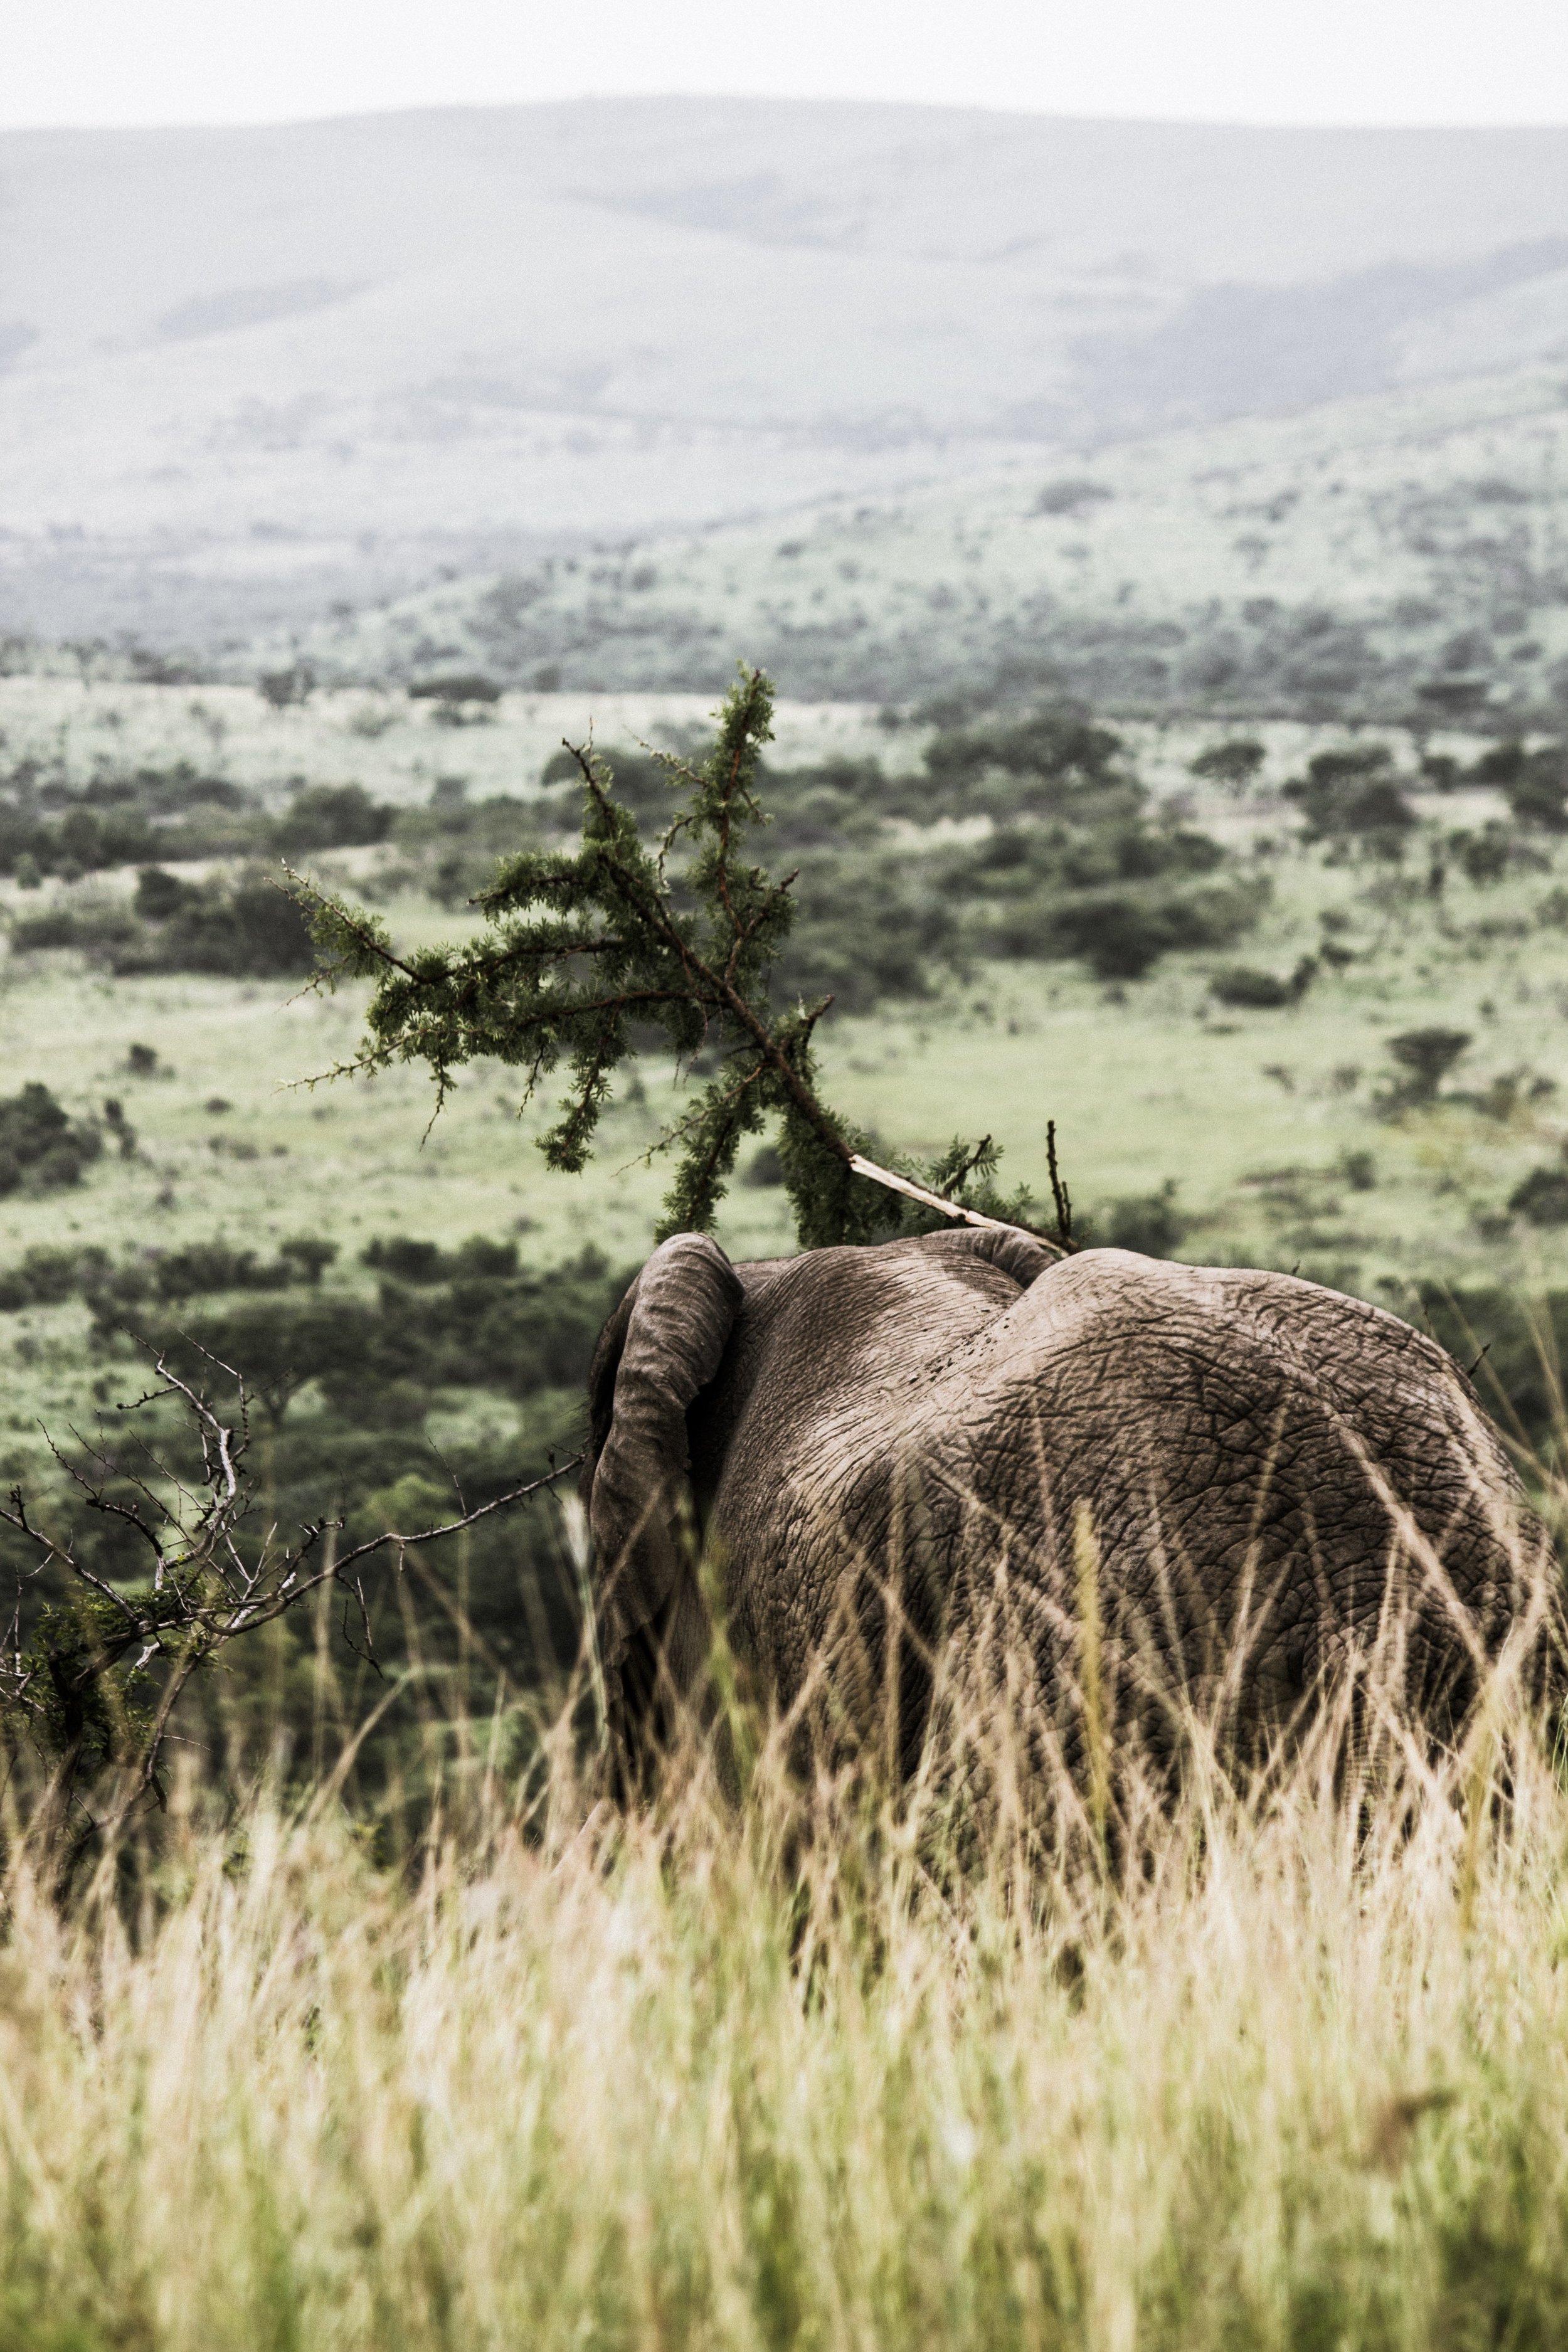 BOTSWANA - OCTOBER